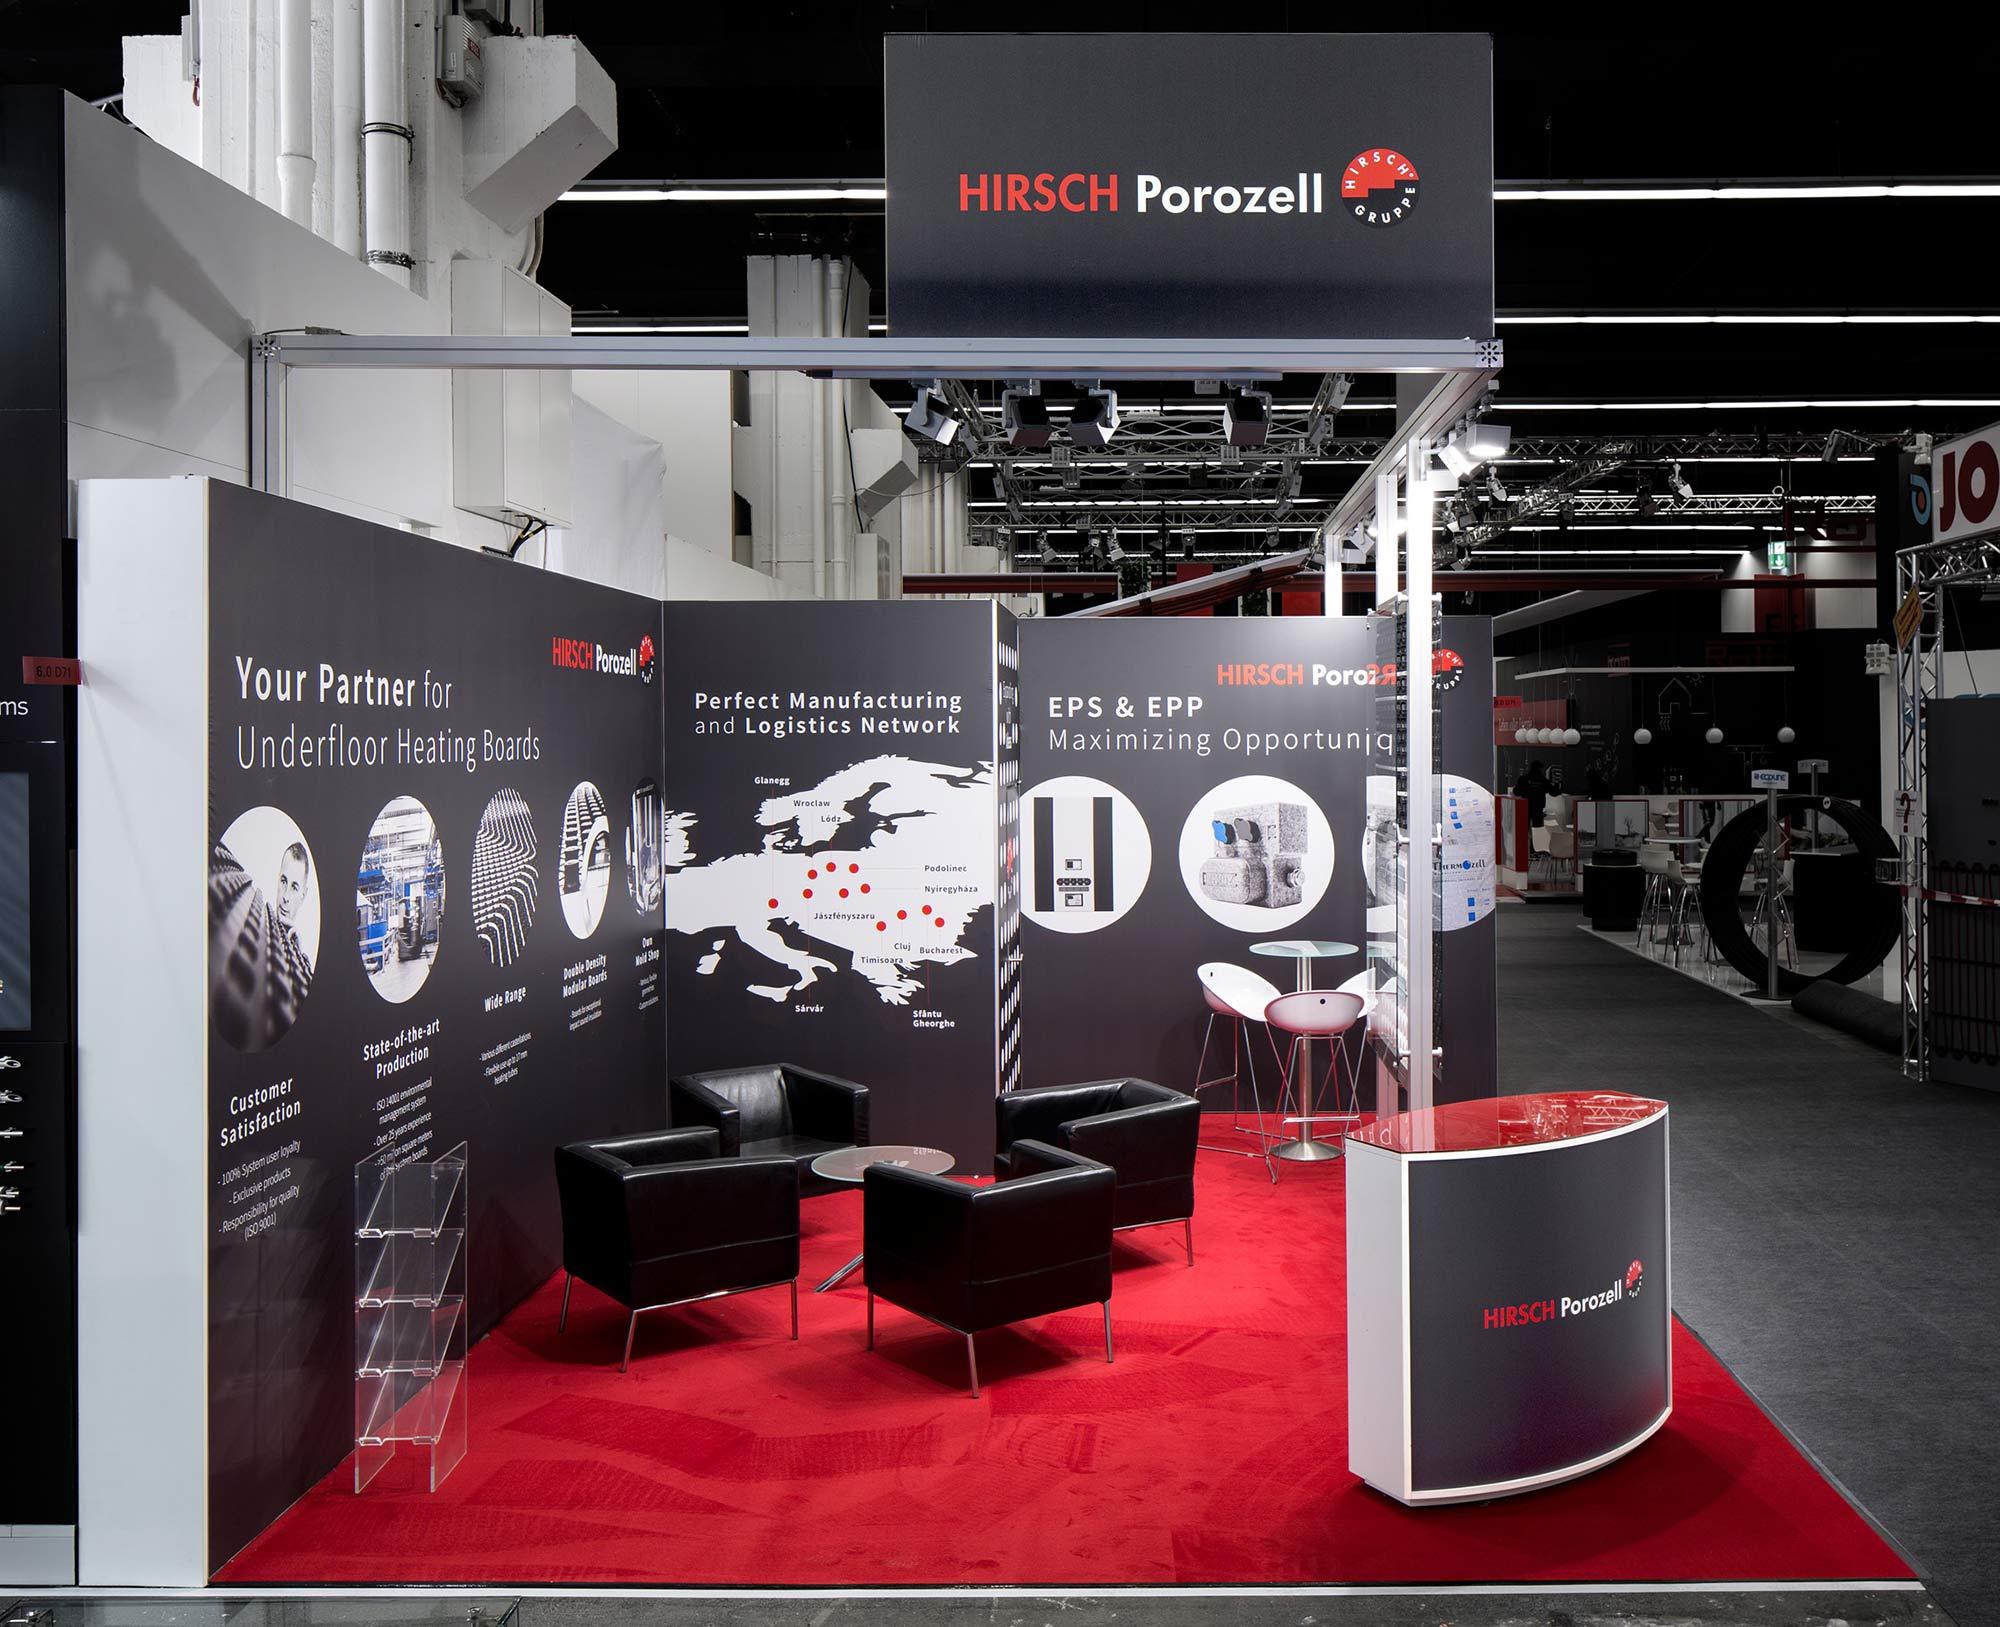 Messestand Hirsch Porozell ISH 2017 Frankfurt